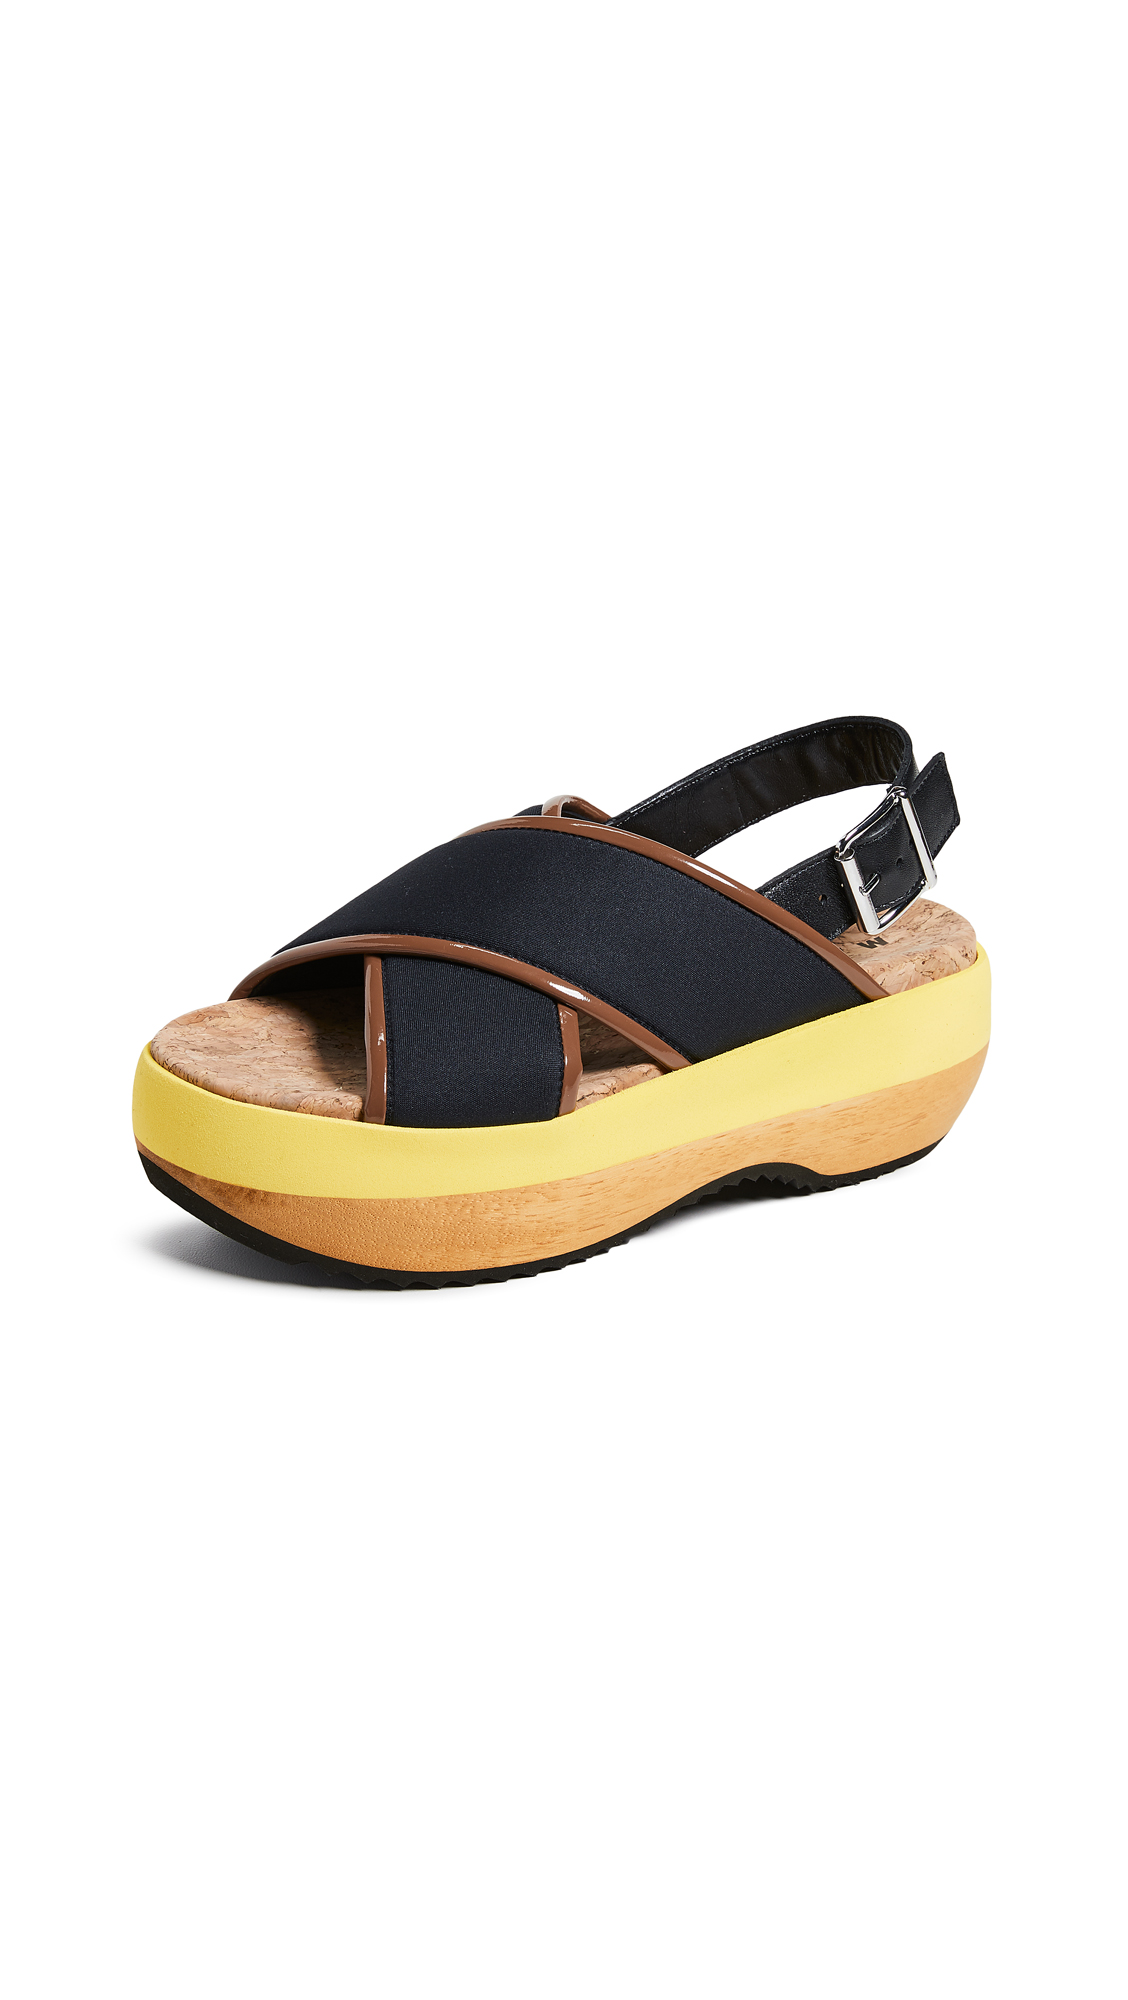 Marni Wedge Criss Cross Sandals - Black/Marmo